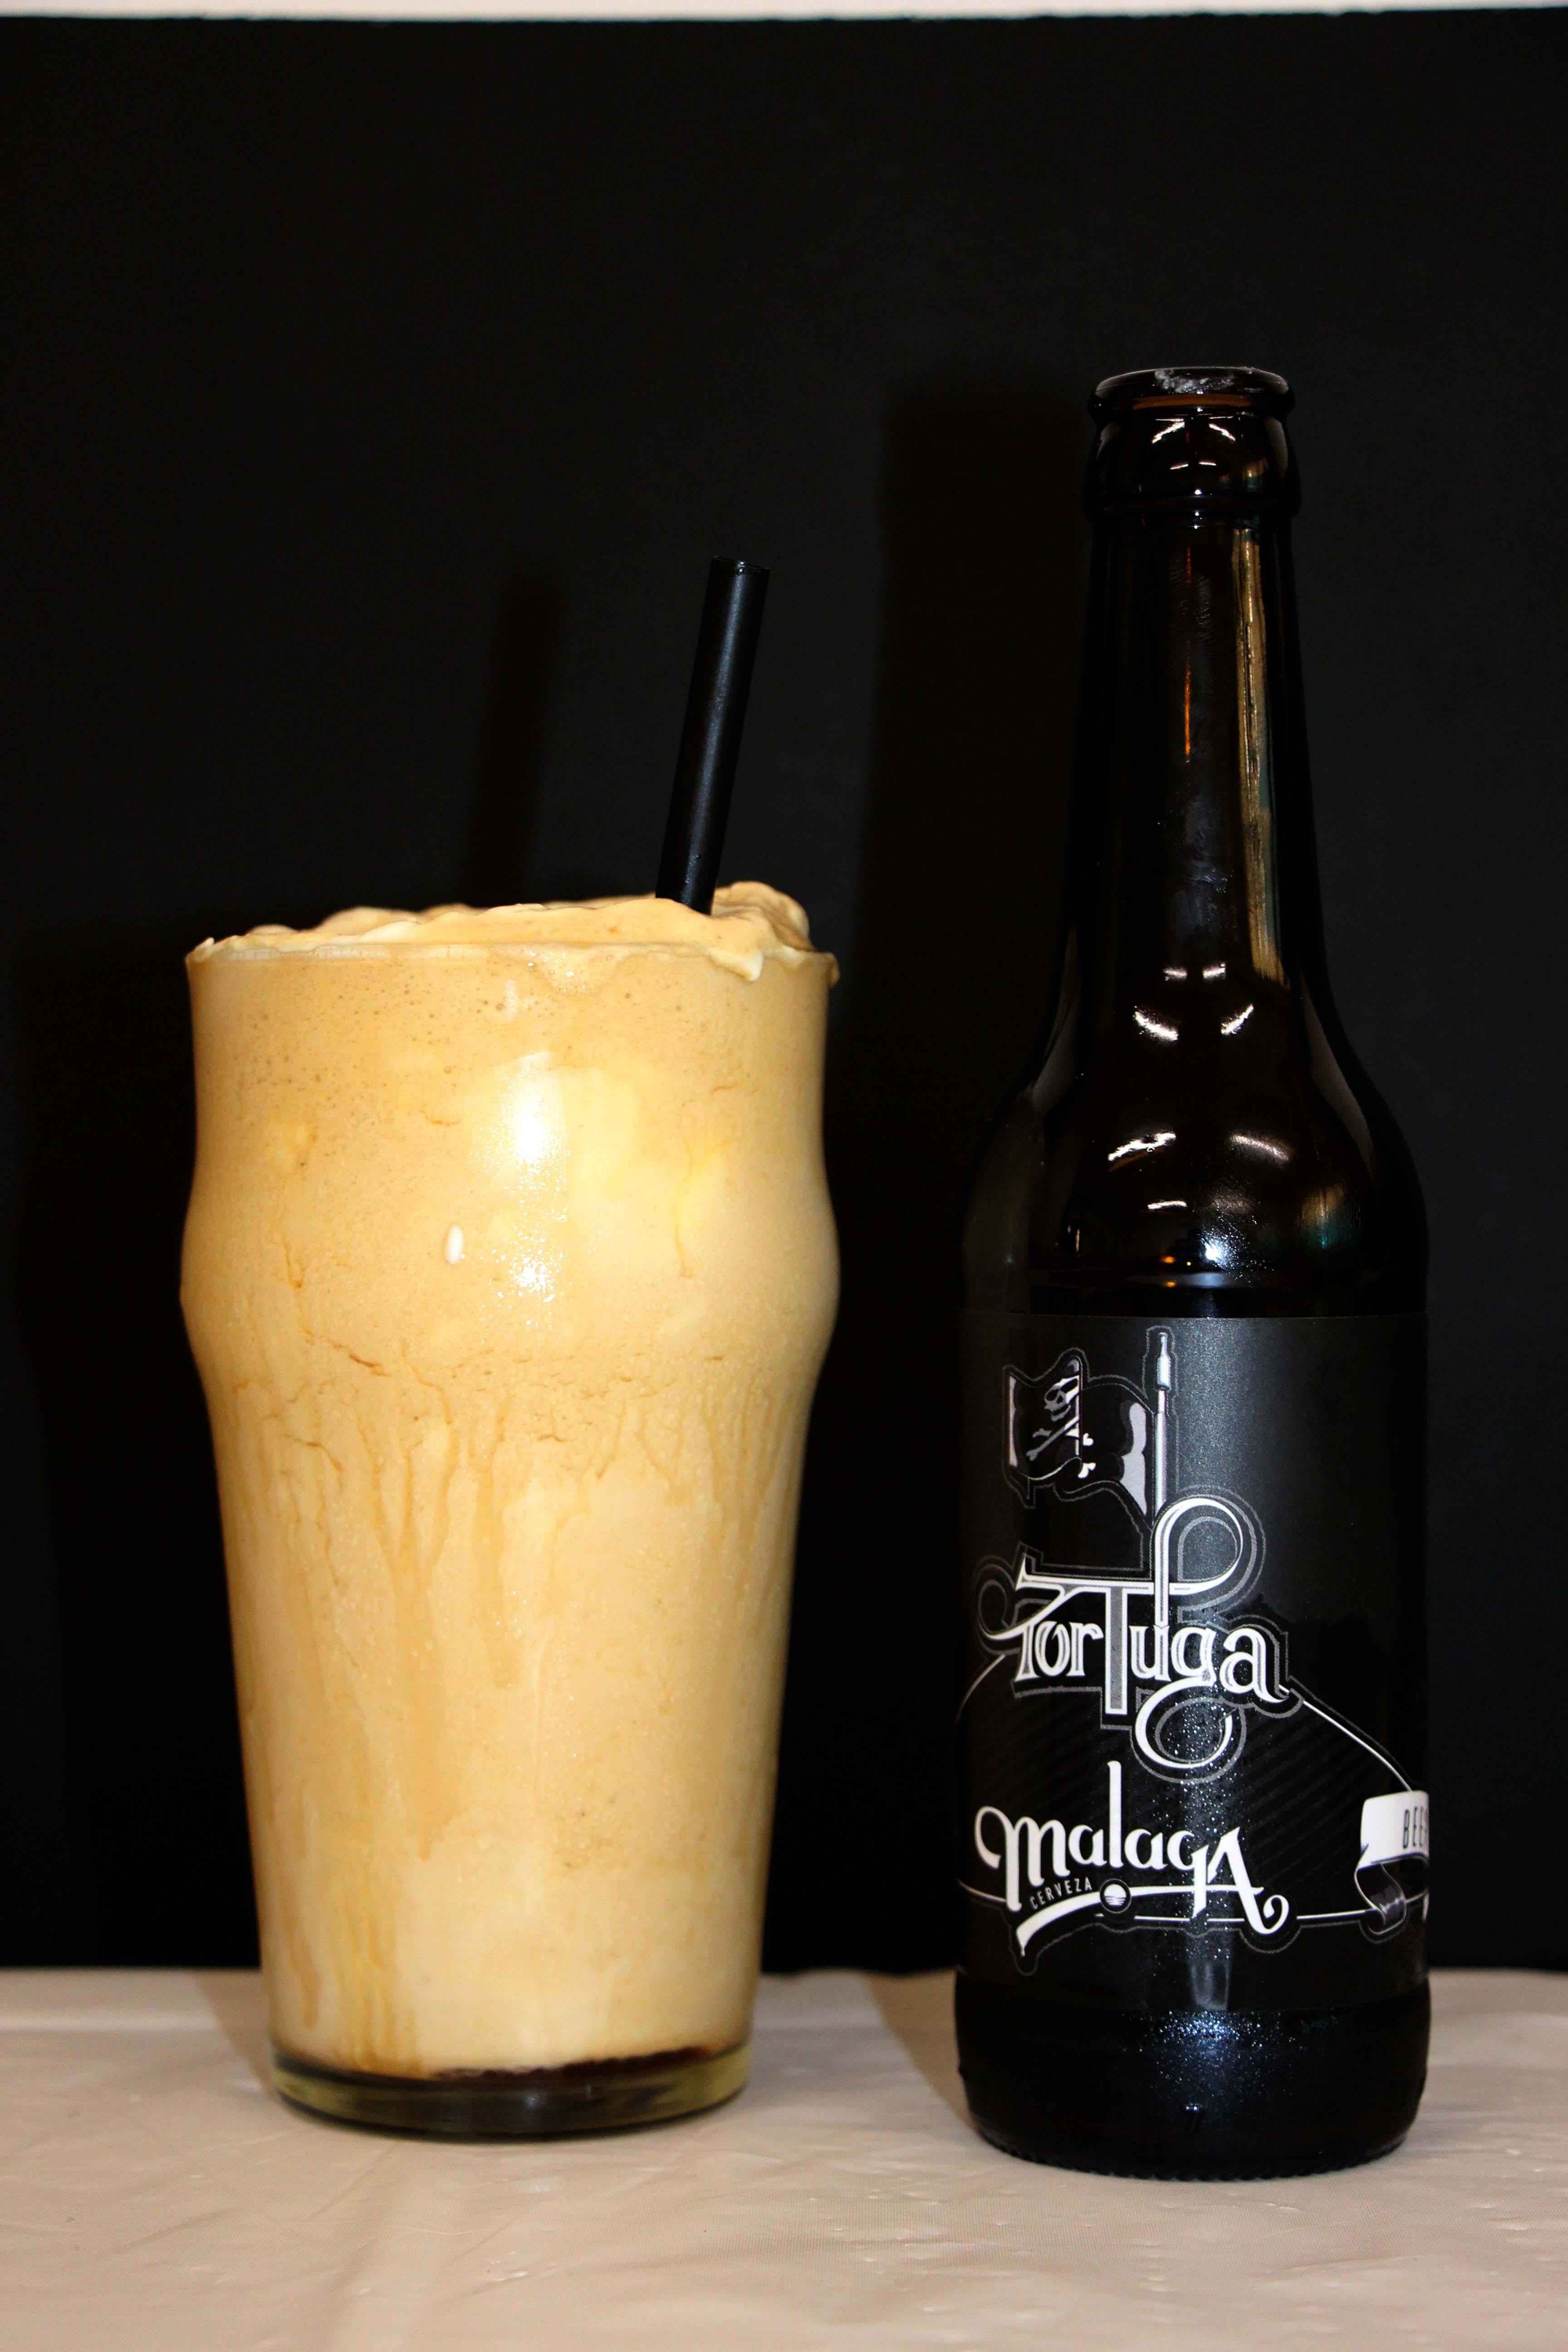 Float de cerveza porter: el mejor postre para el verano